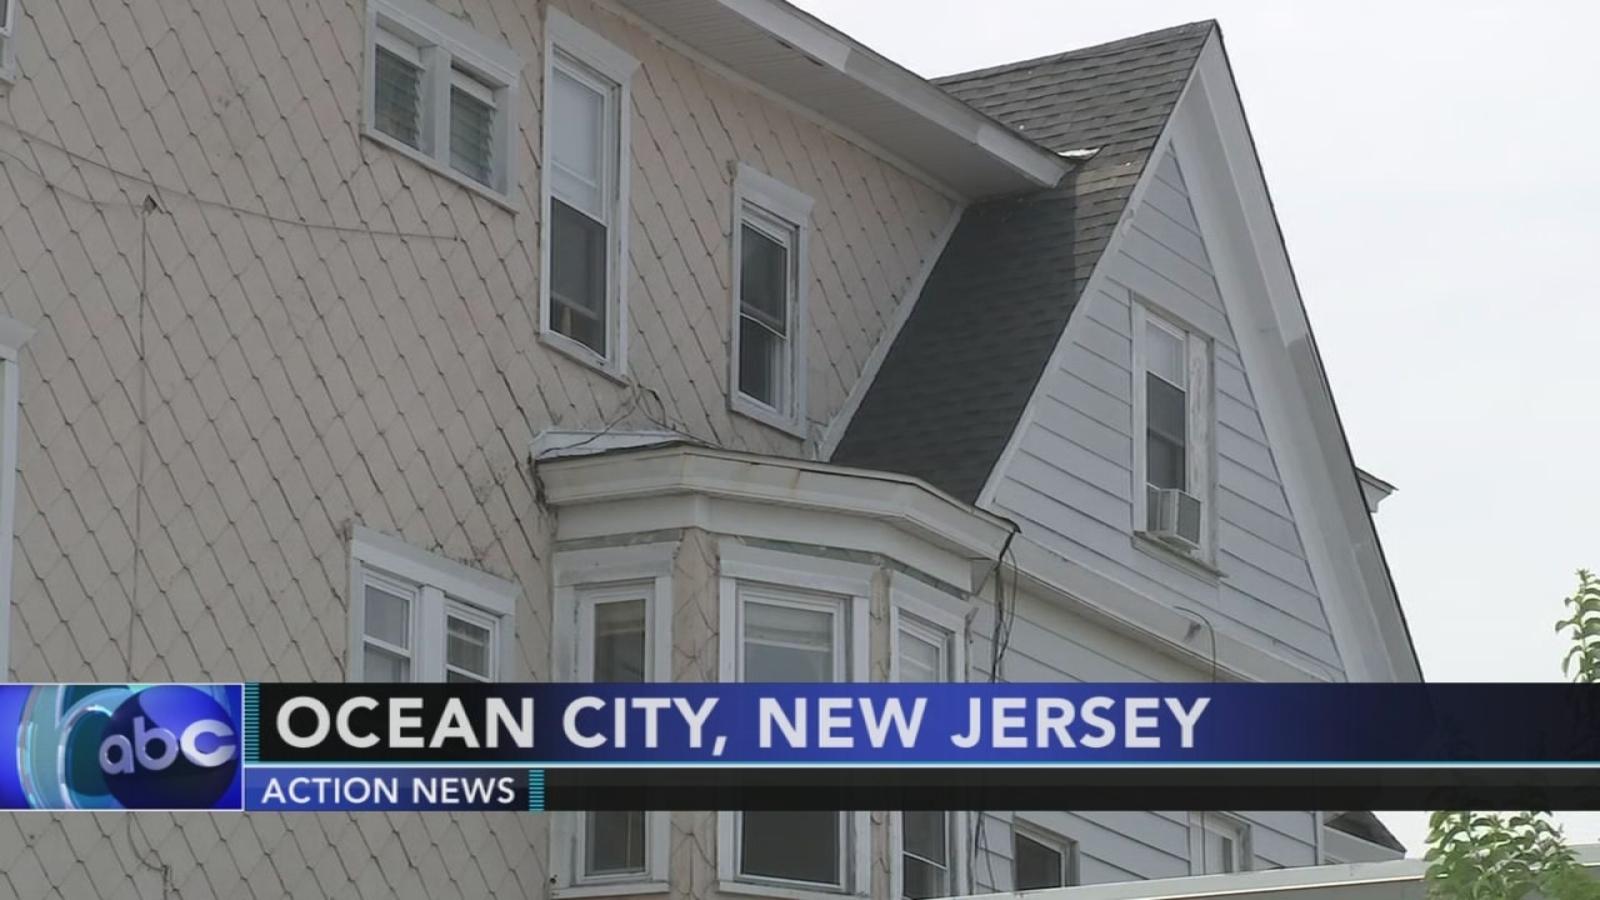 Arrest Made In Ocean City Nj Murder 6abc Philadelphia